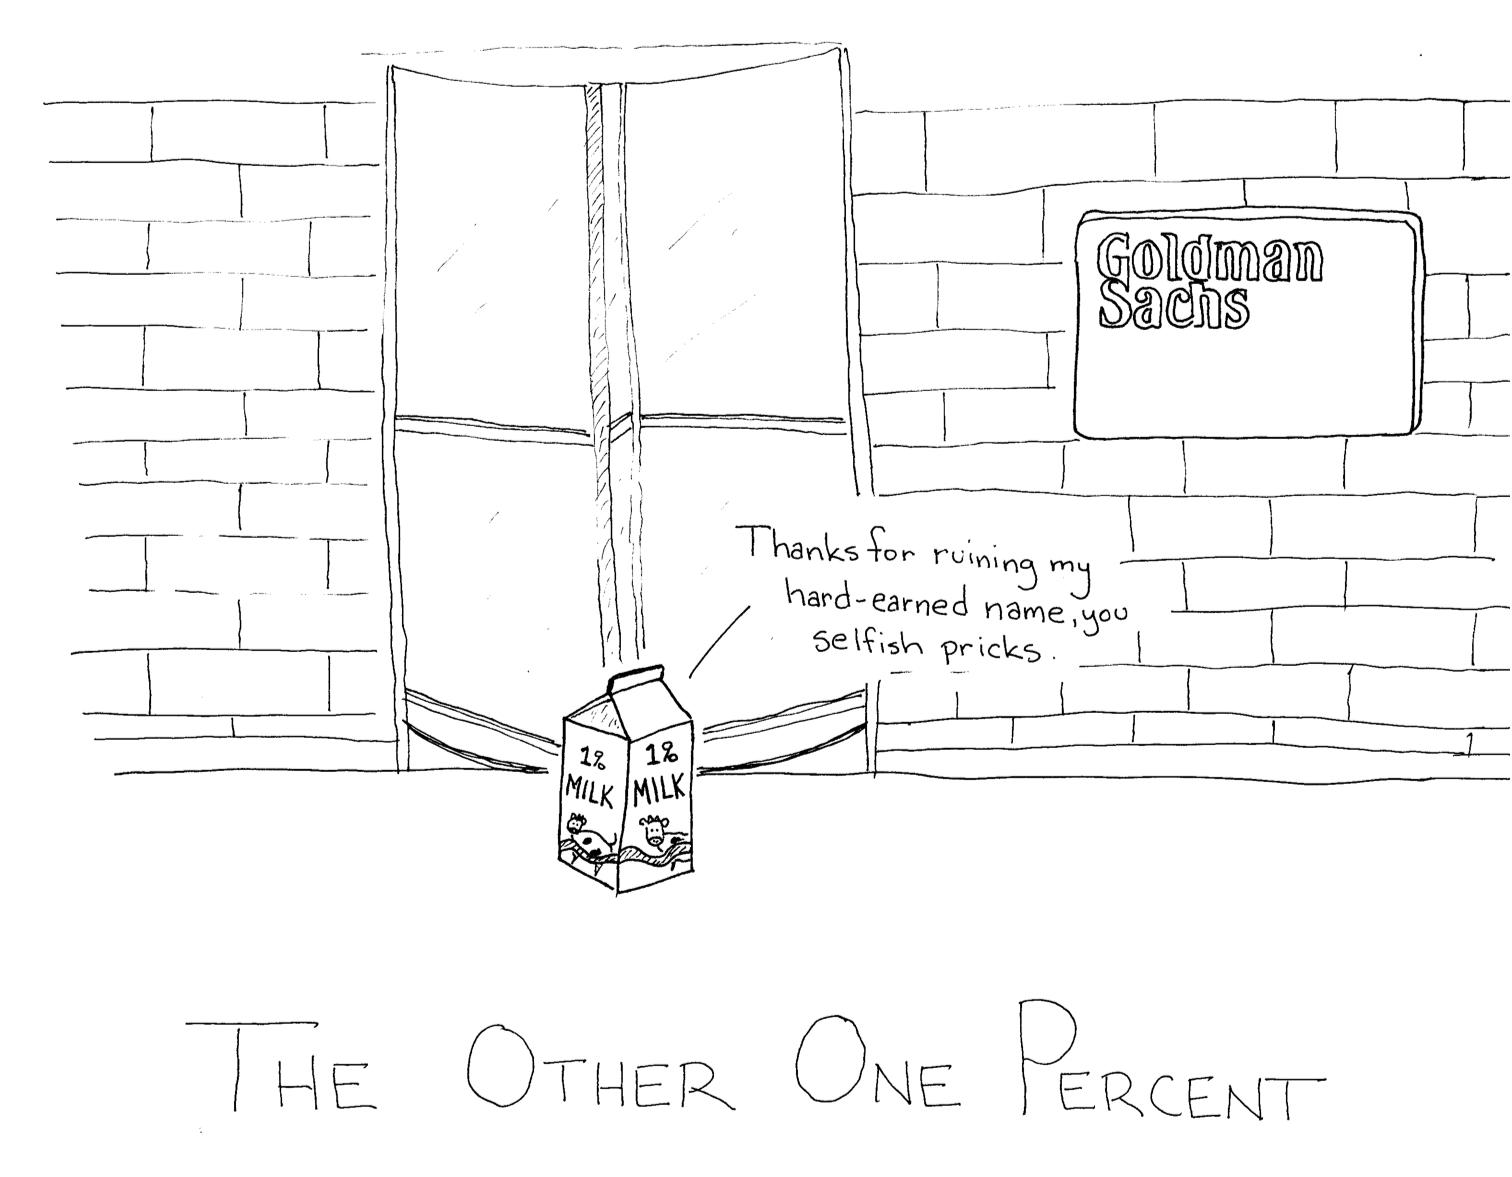 2011-11-04-onepercent.jpg